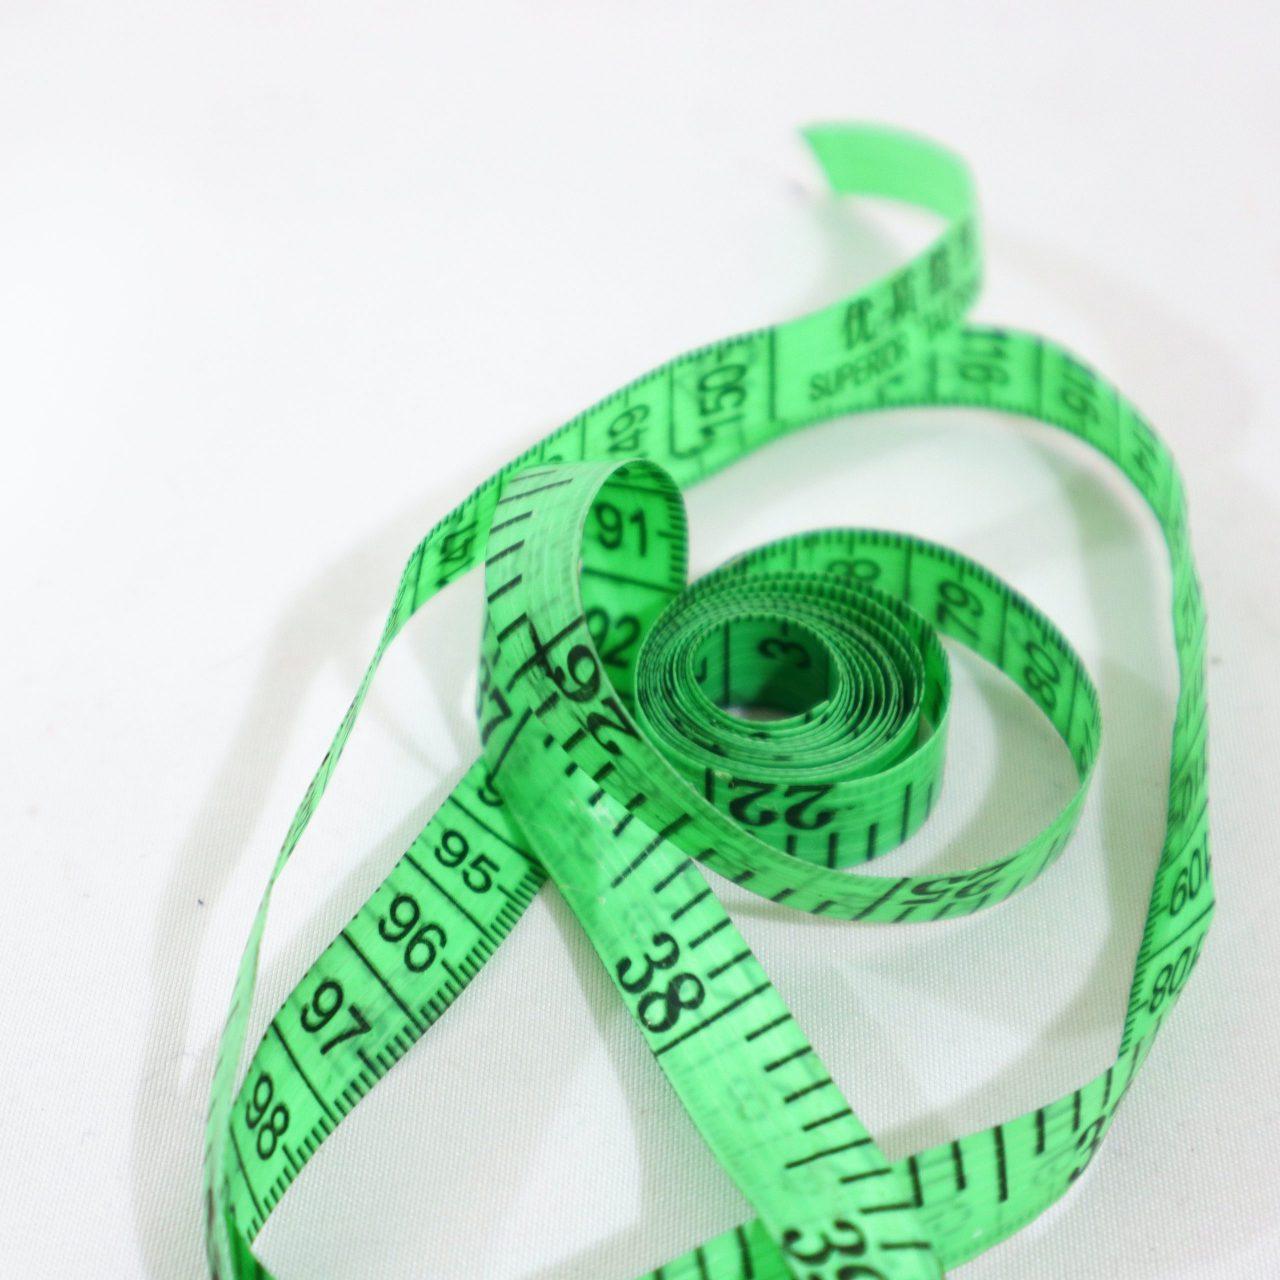 https://www.jhl.com/wp-content/uploads/2021/07/Brand-Measurement-Blong-Image-4-square-scaled-e1626724140918-1280x1280.jpg